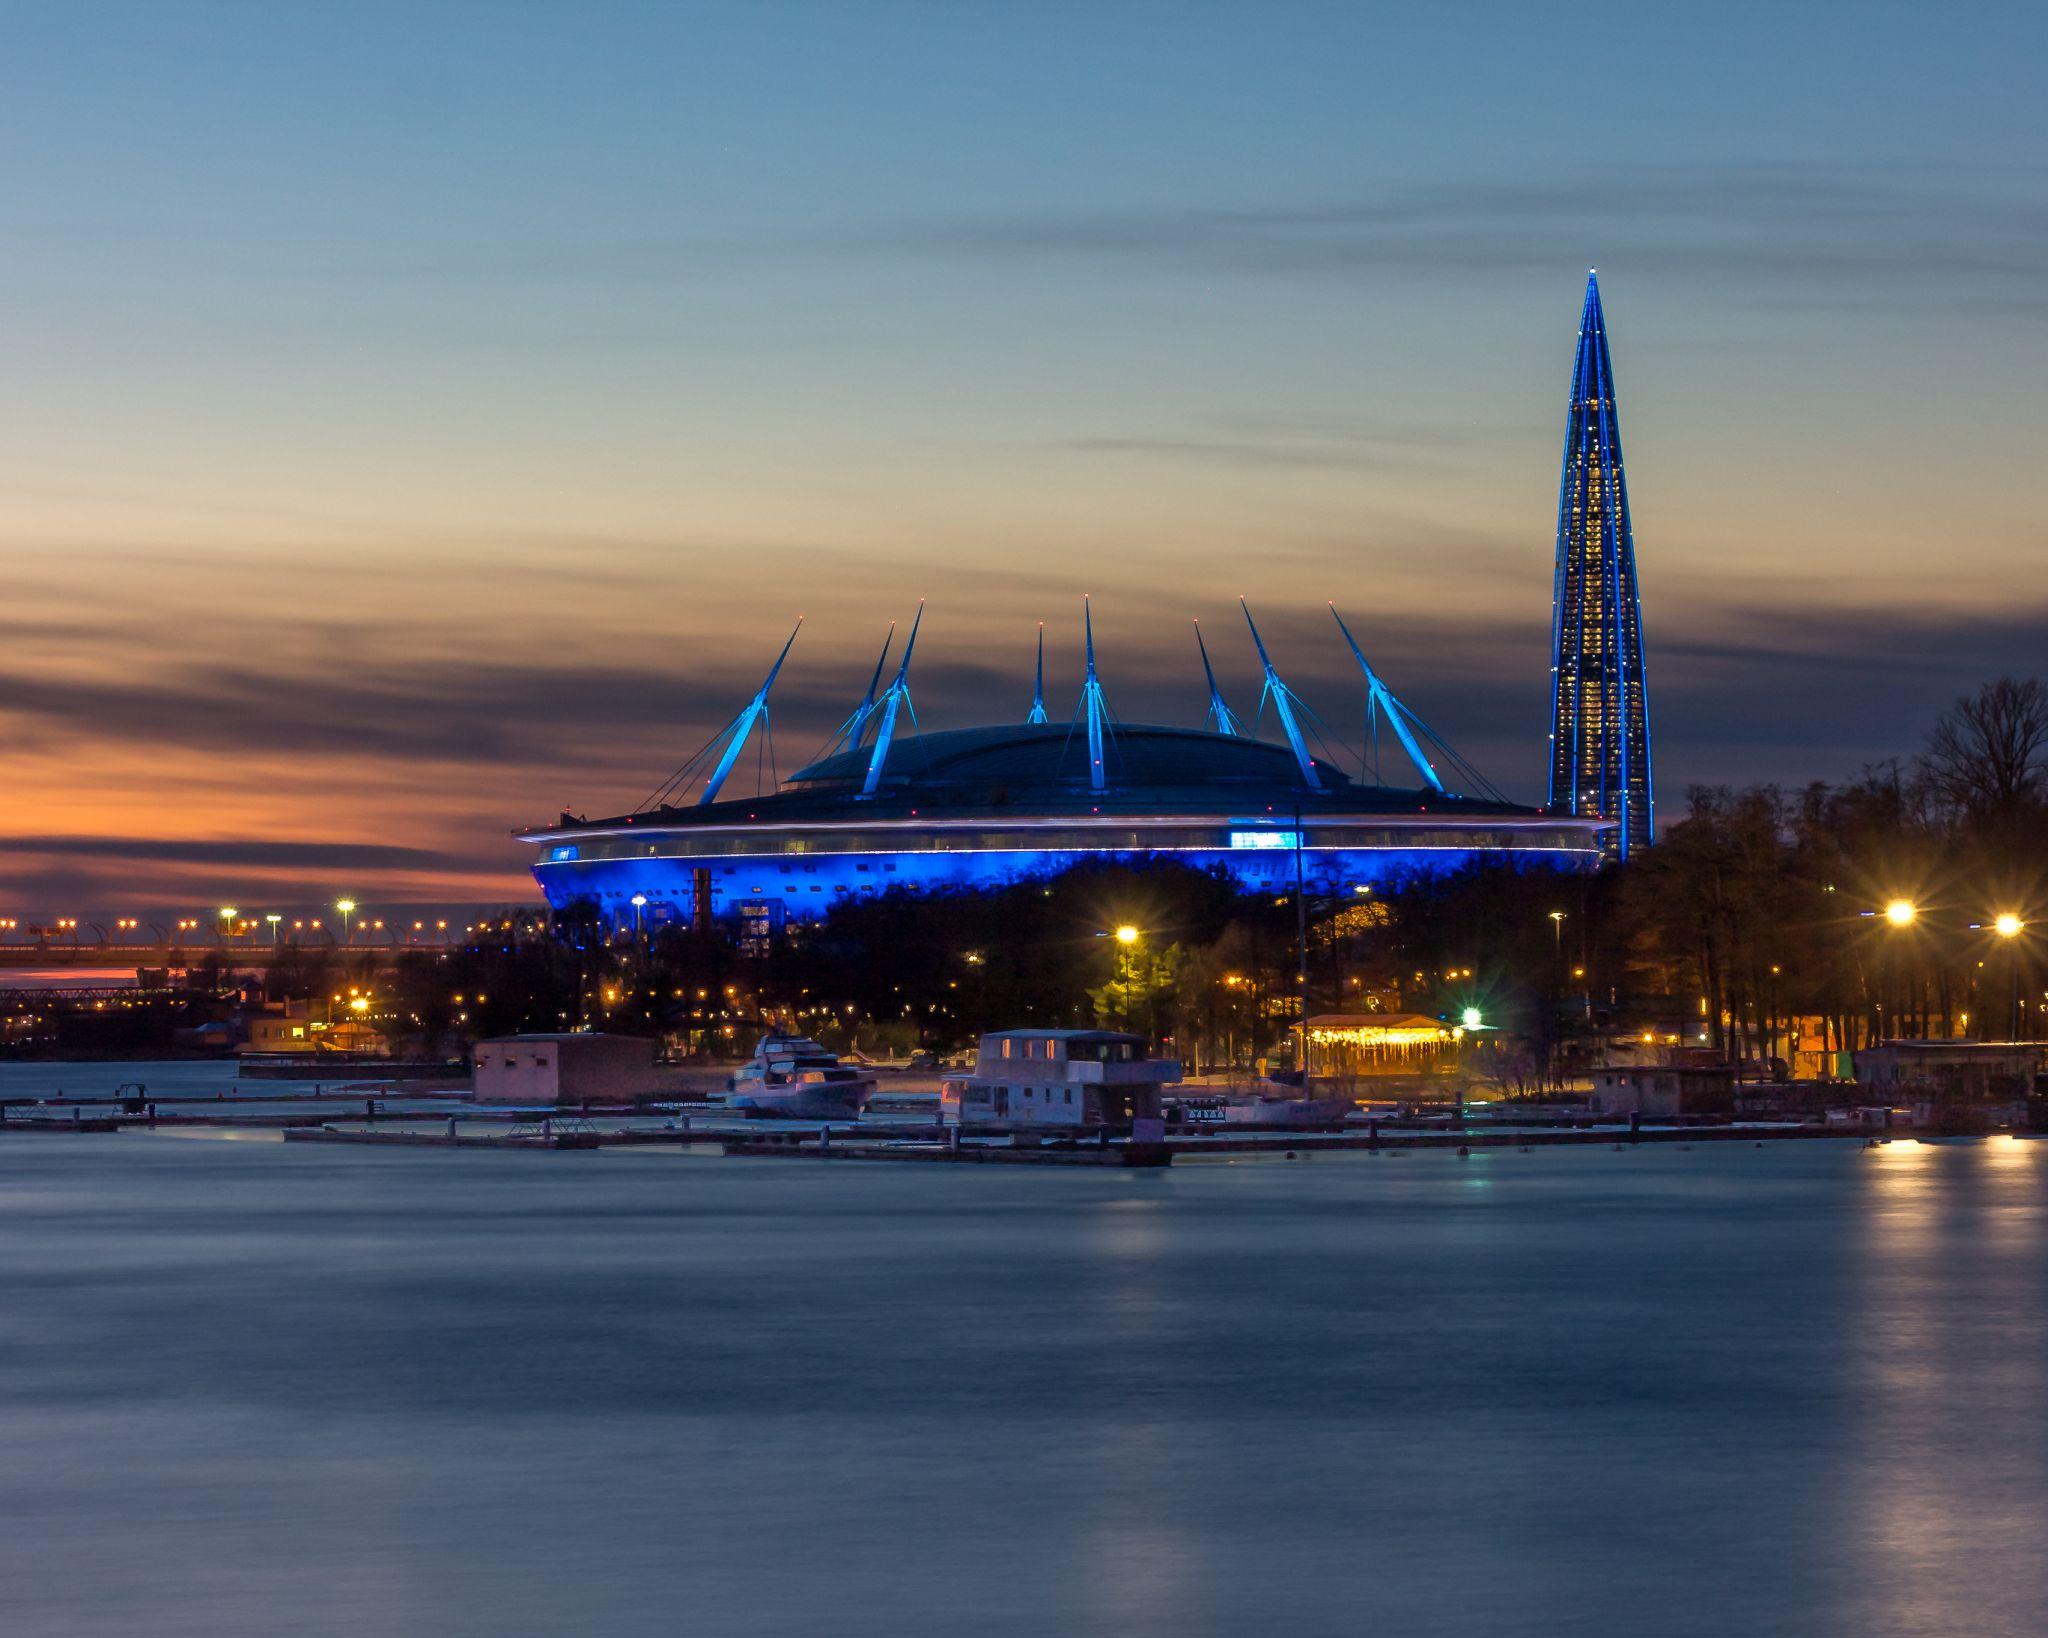 Bolshoi Petrovsky Bridge, Gazprom Arena, Lakhta Center, Russian Federation